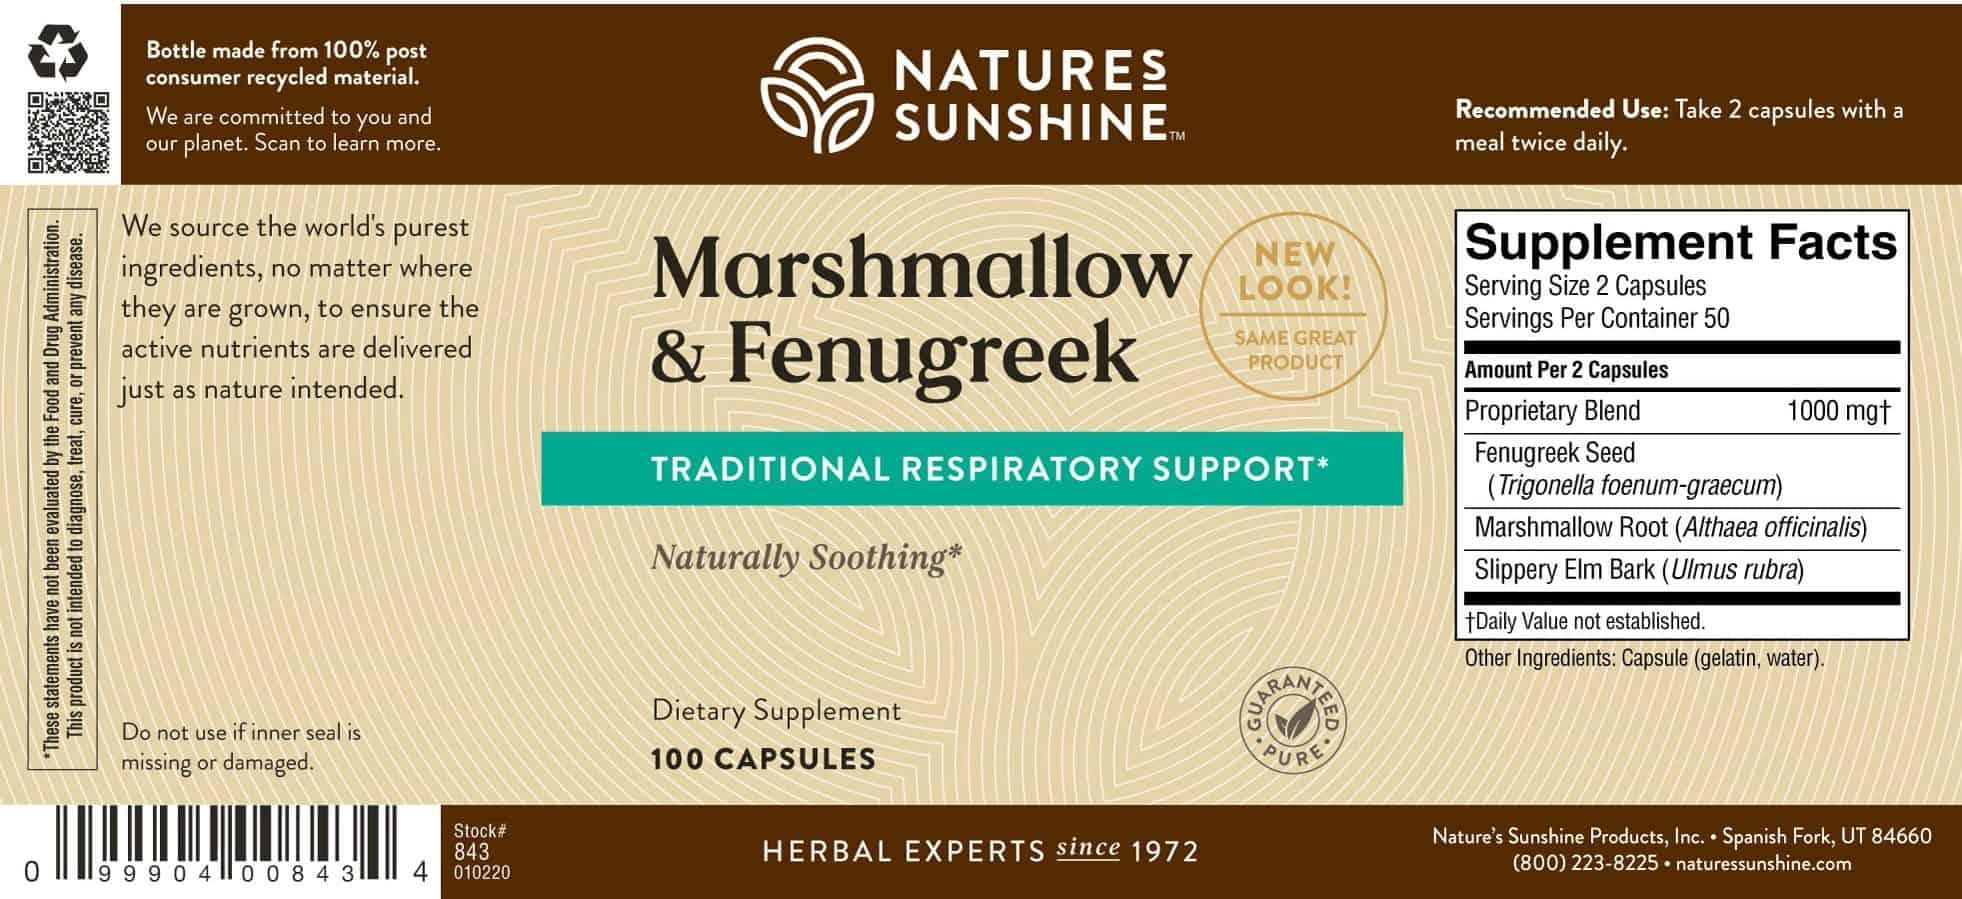 Natures Sunshine Marshmallow & Fenugreek